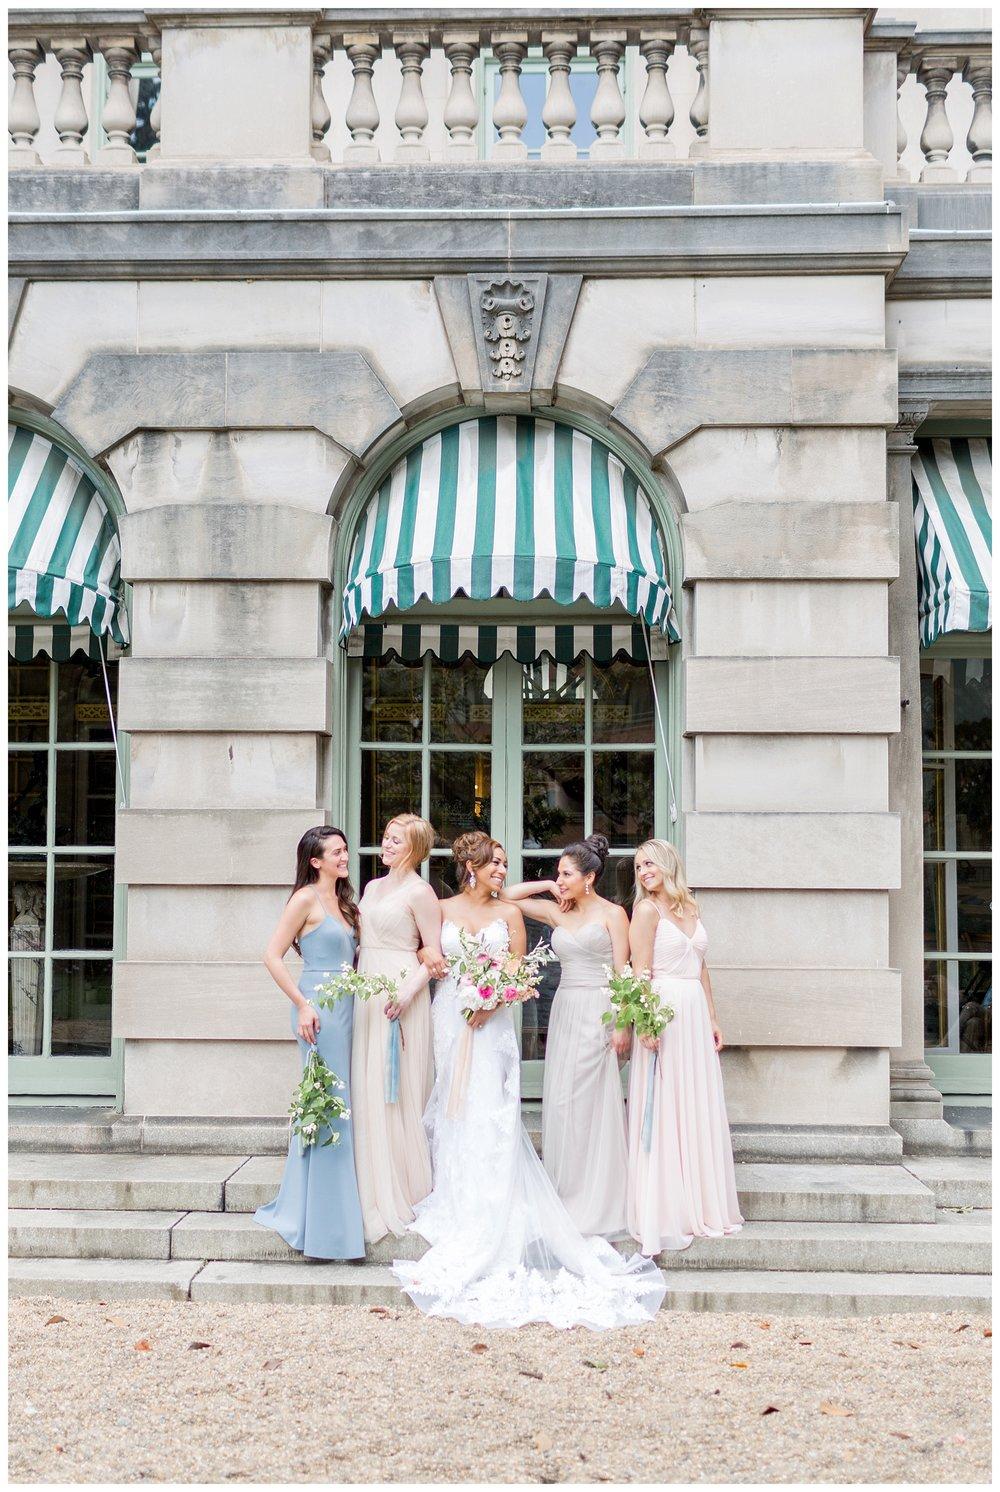 Anderson House Wedding DC Wedding Photographer Kir Tuben_0017.jpg